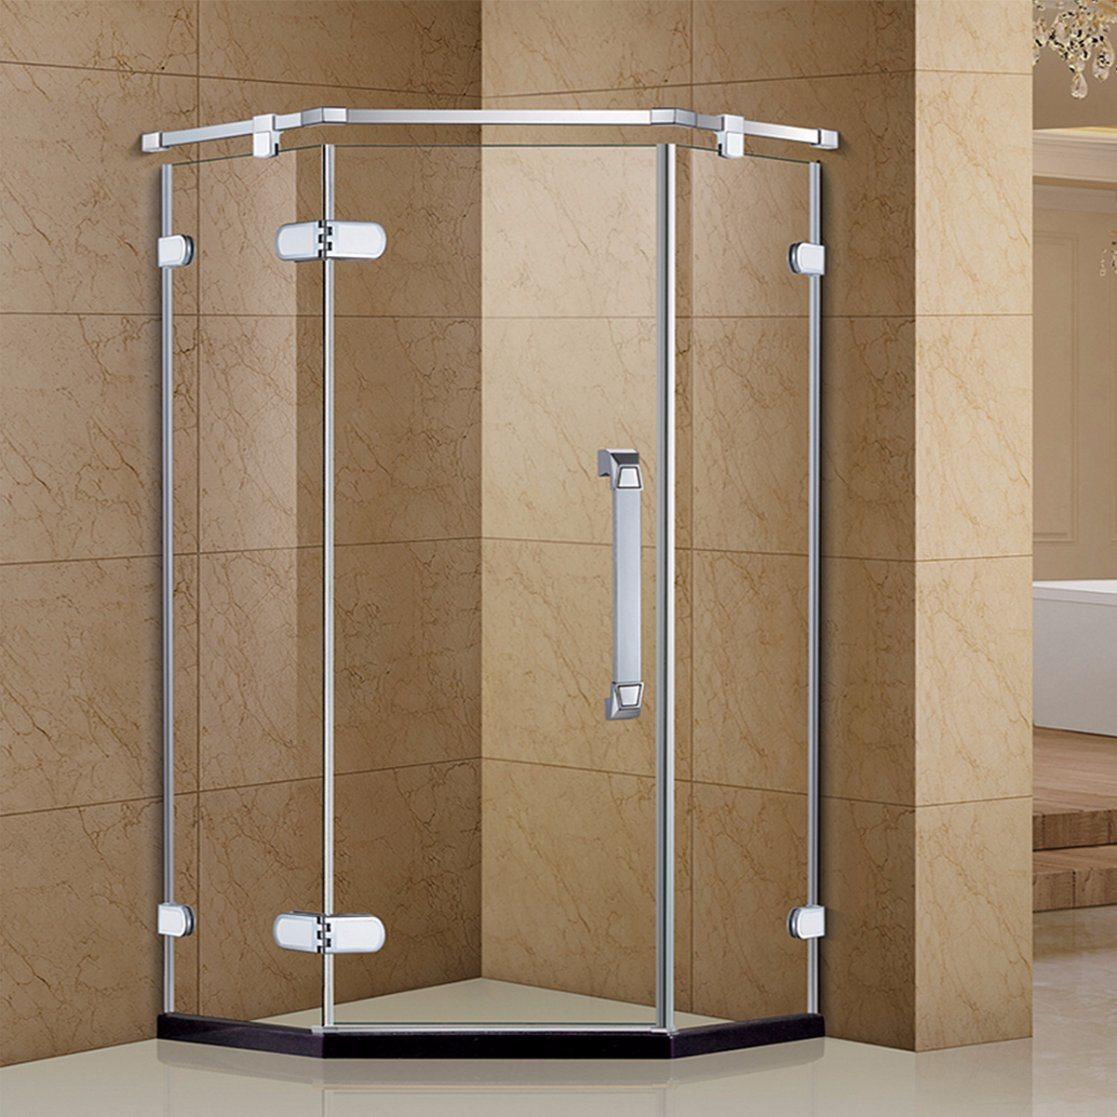 China Bathroom Shower Bath Cubicle Simple Shower Room - China Shower ...